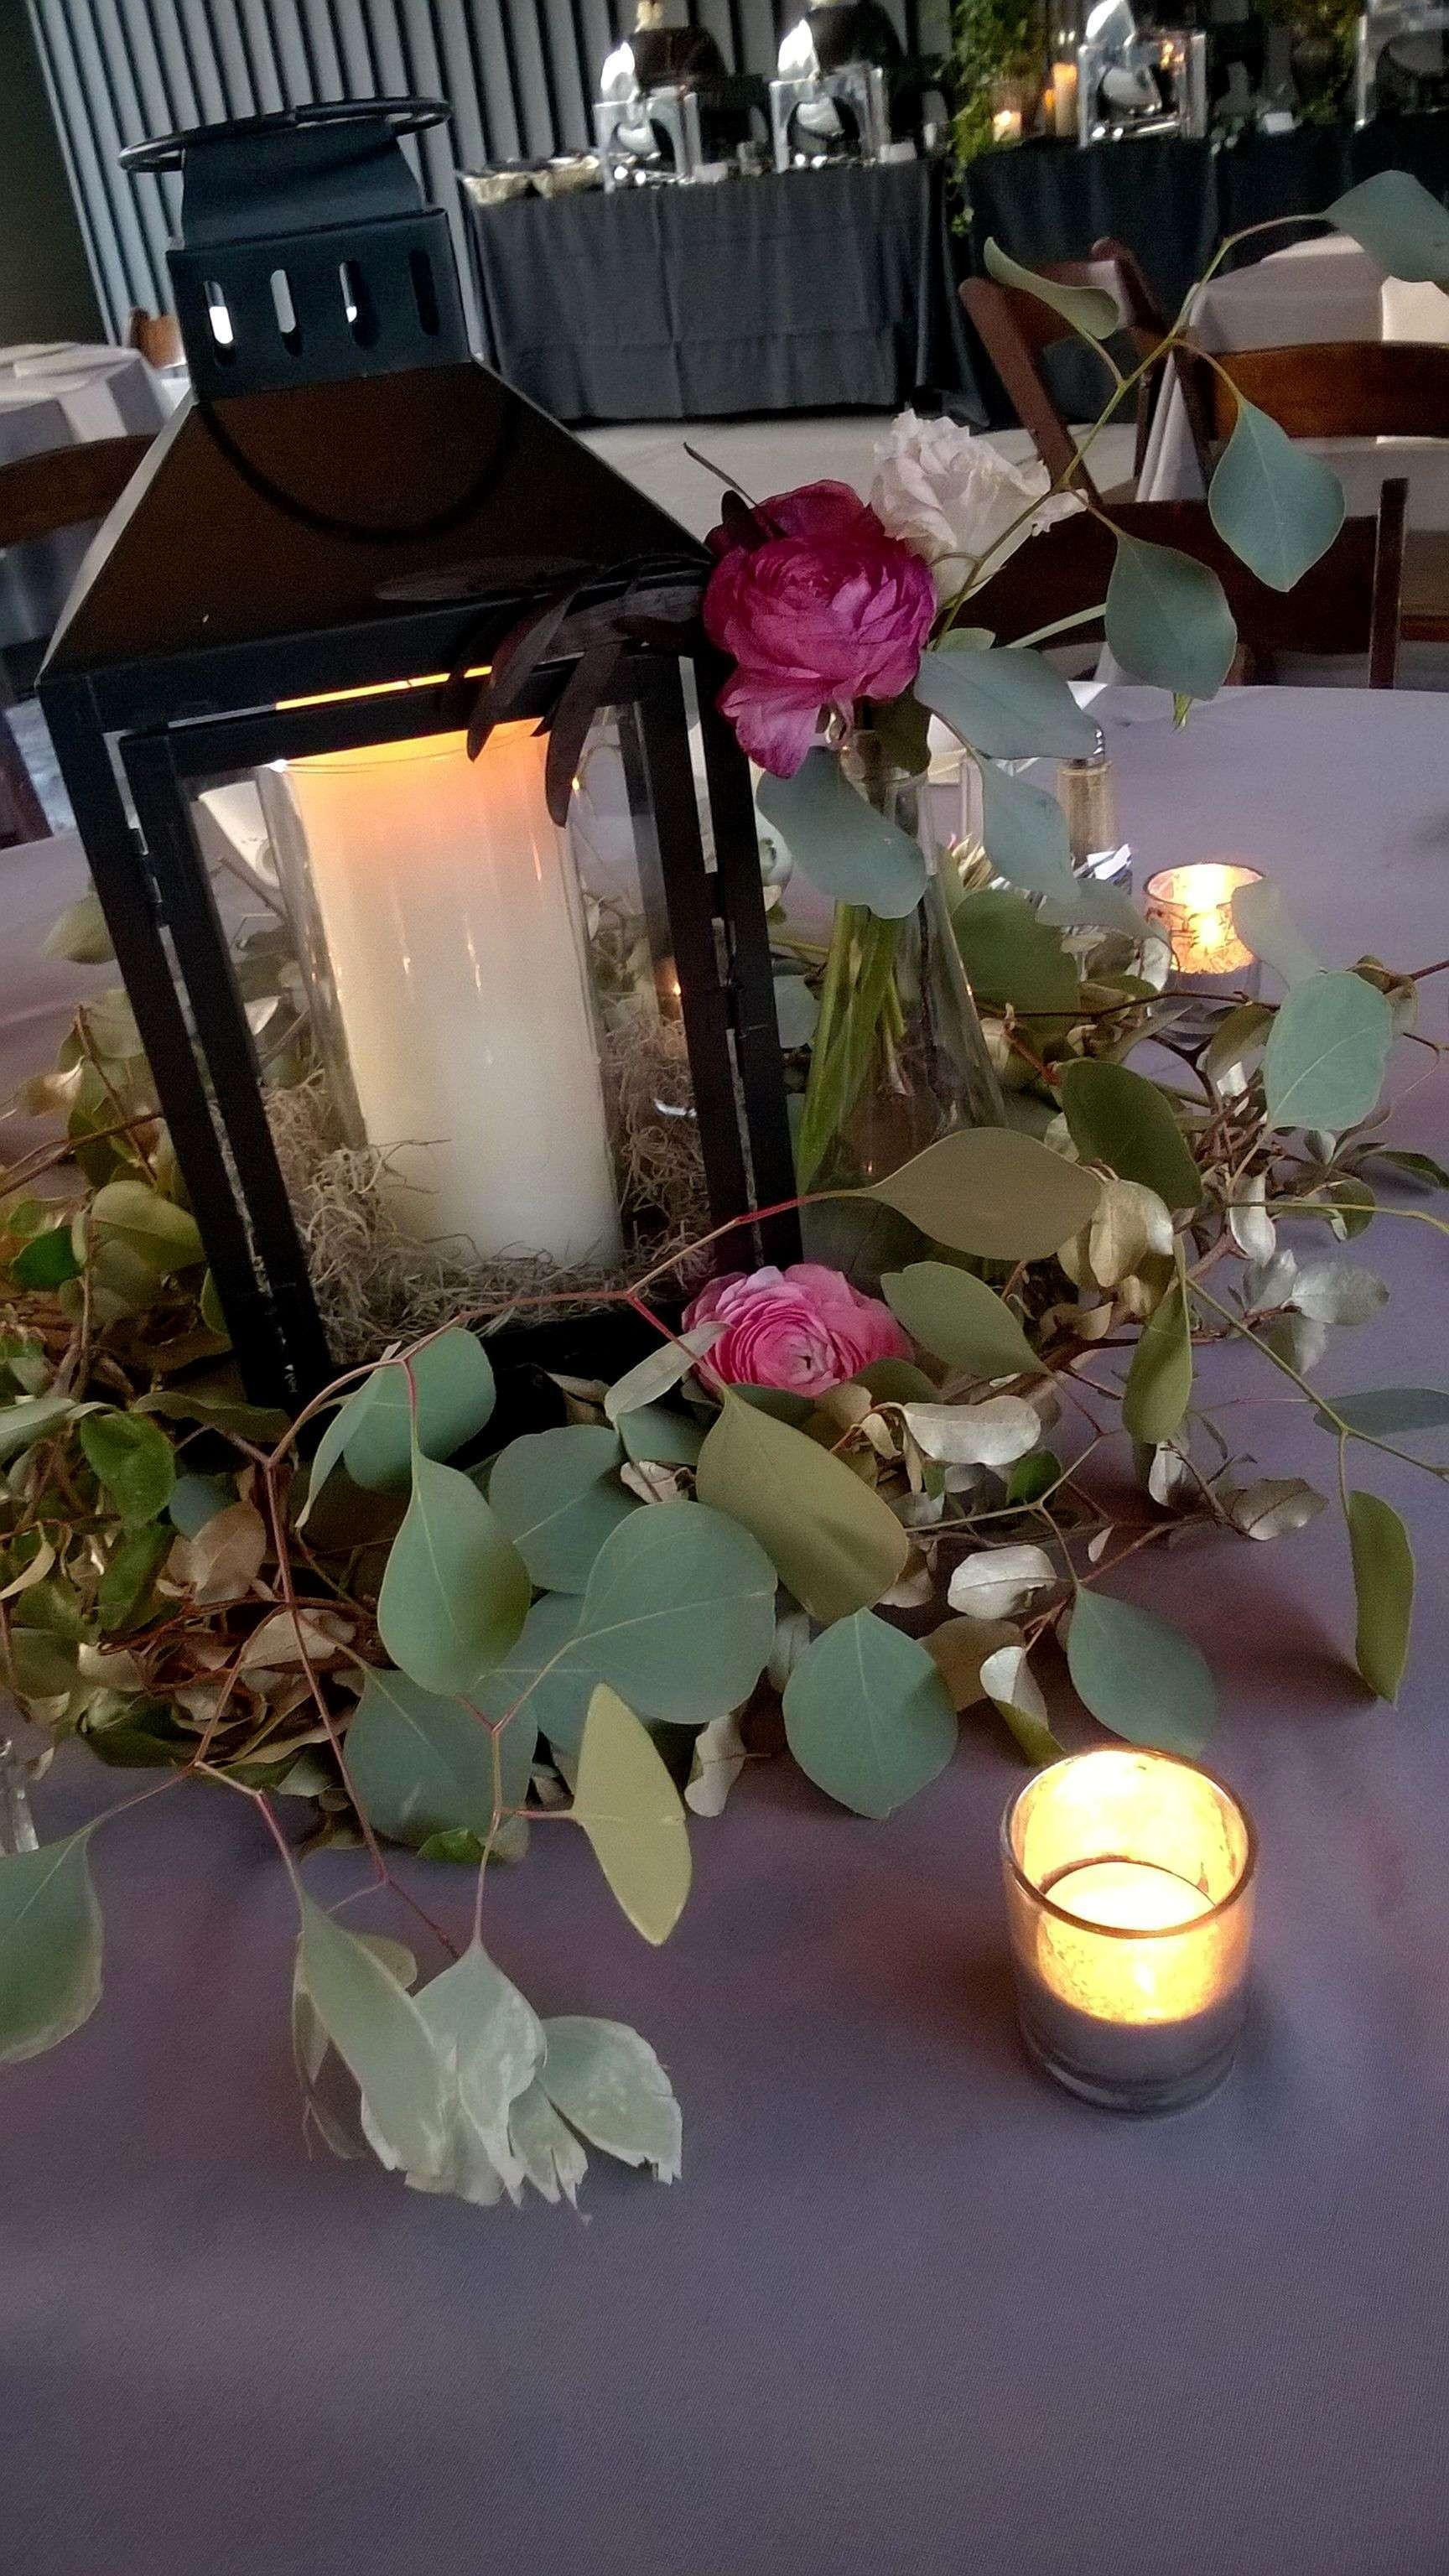 cheap flower vases for weddings of diy outdoor wedding decorations fresh jar flower 1h vases bud with regard to 0d design cheap wedding diy outdoor wedding decorations new 46 elegant diy wedding decor